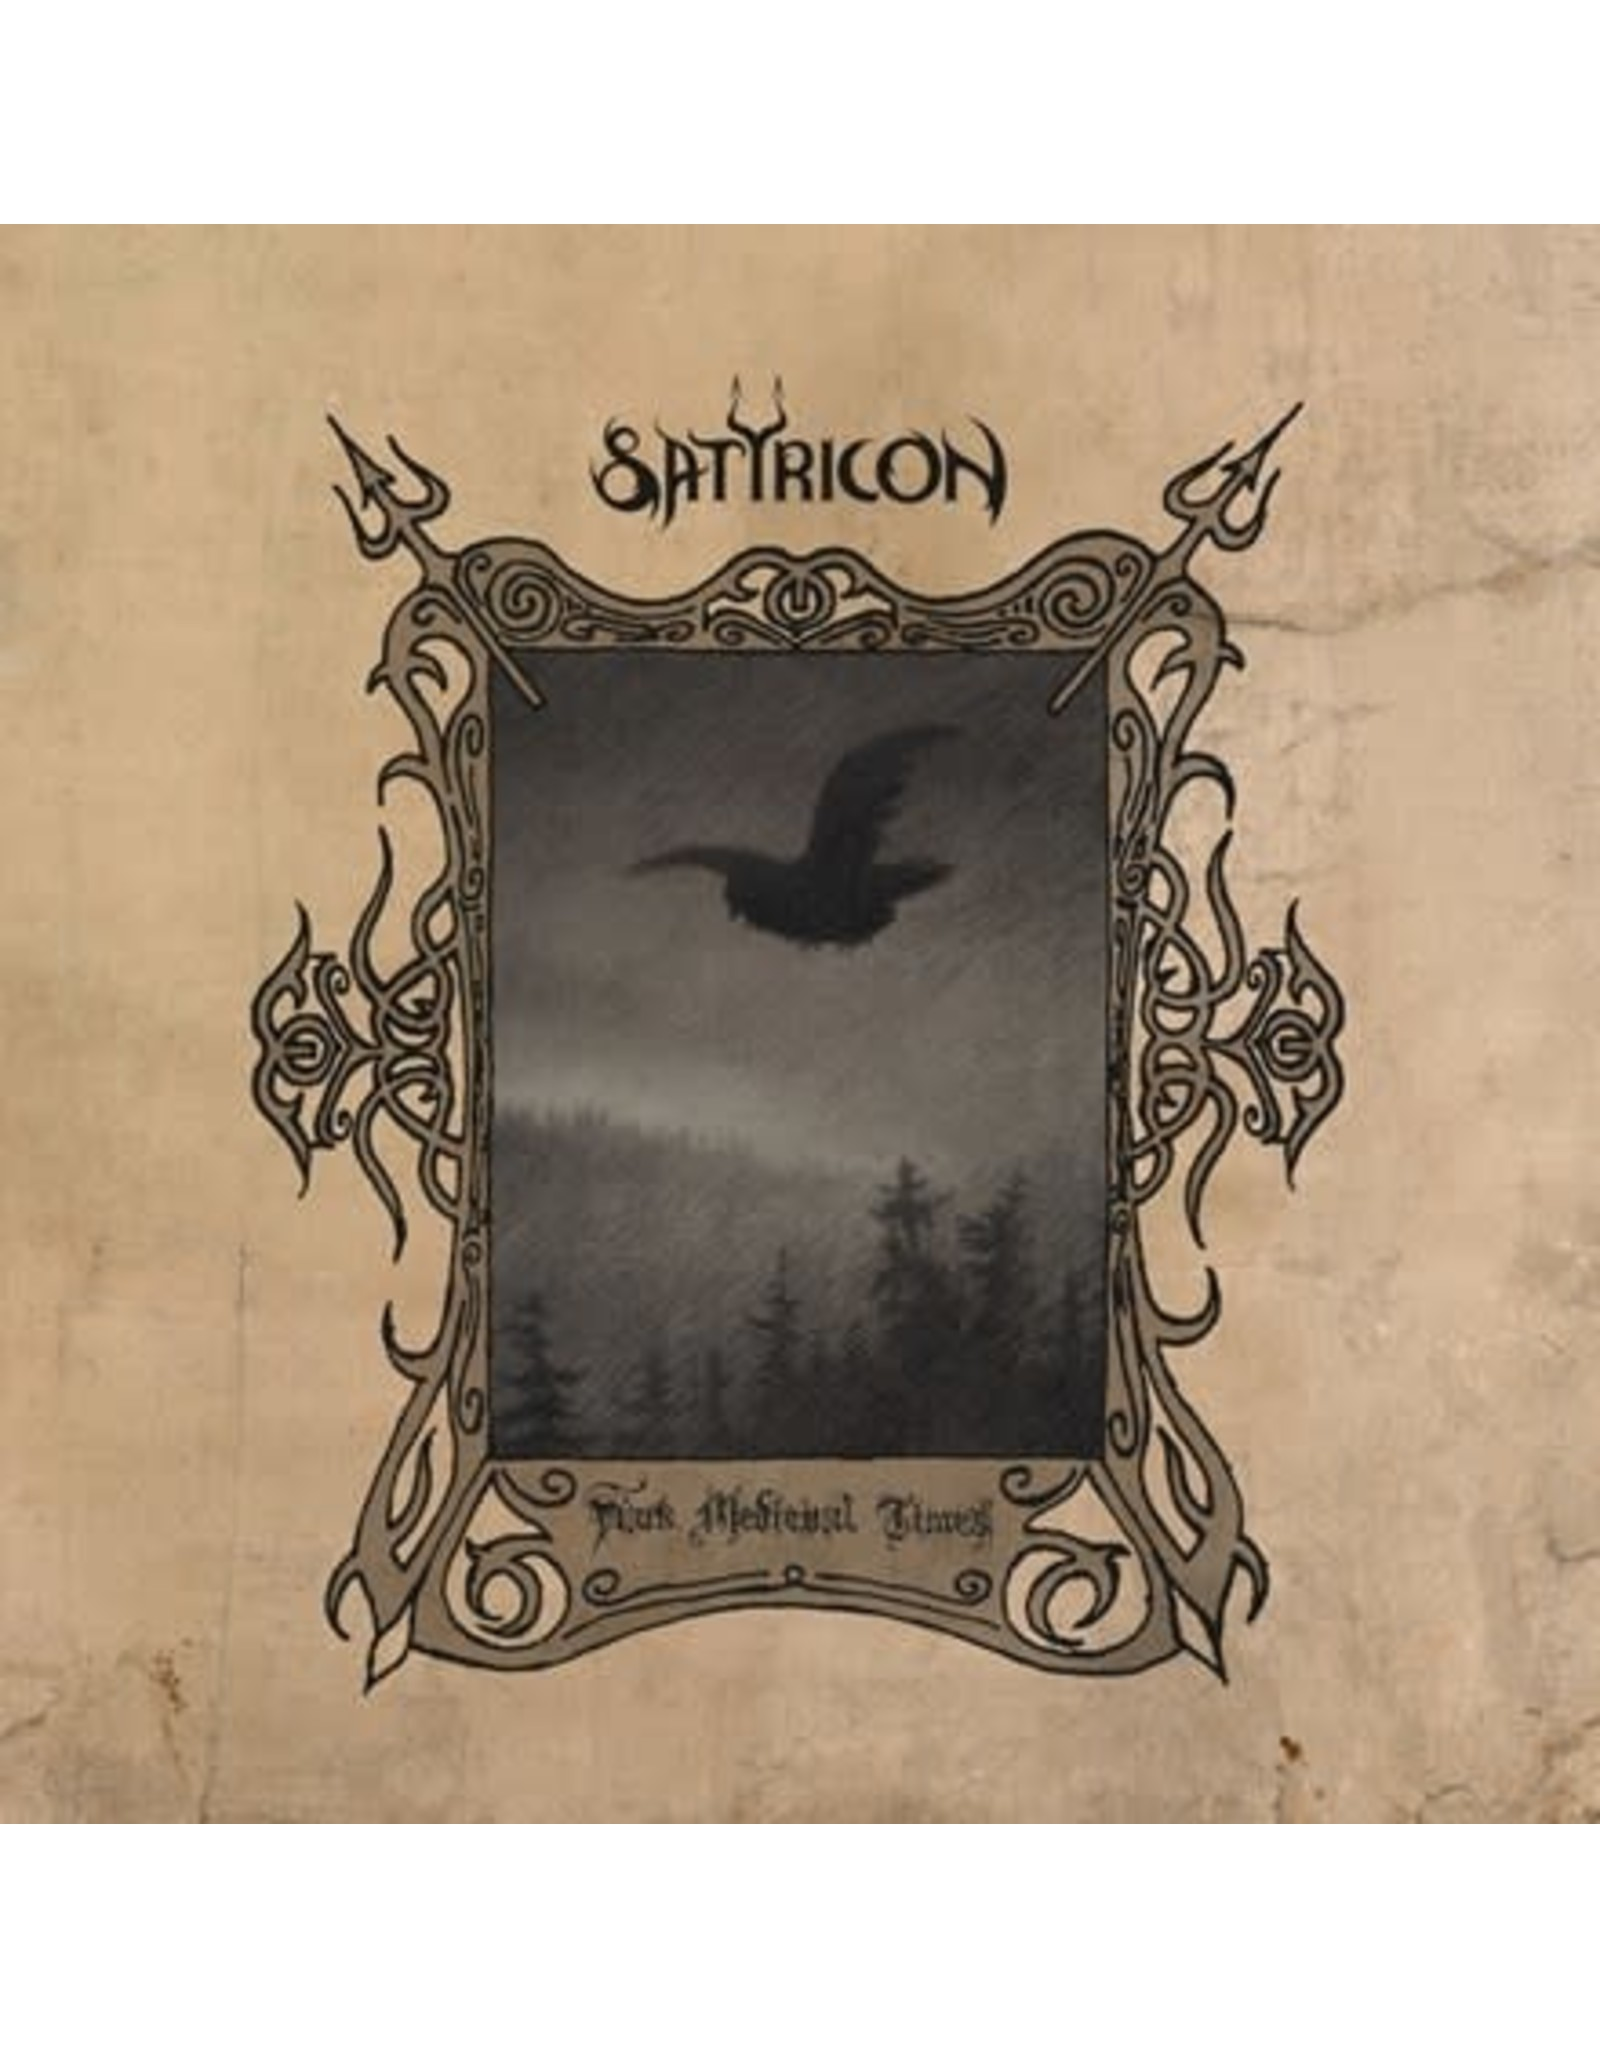 Napalm Satyricon: Dark Medieval Times LP